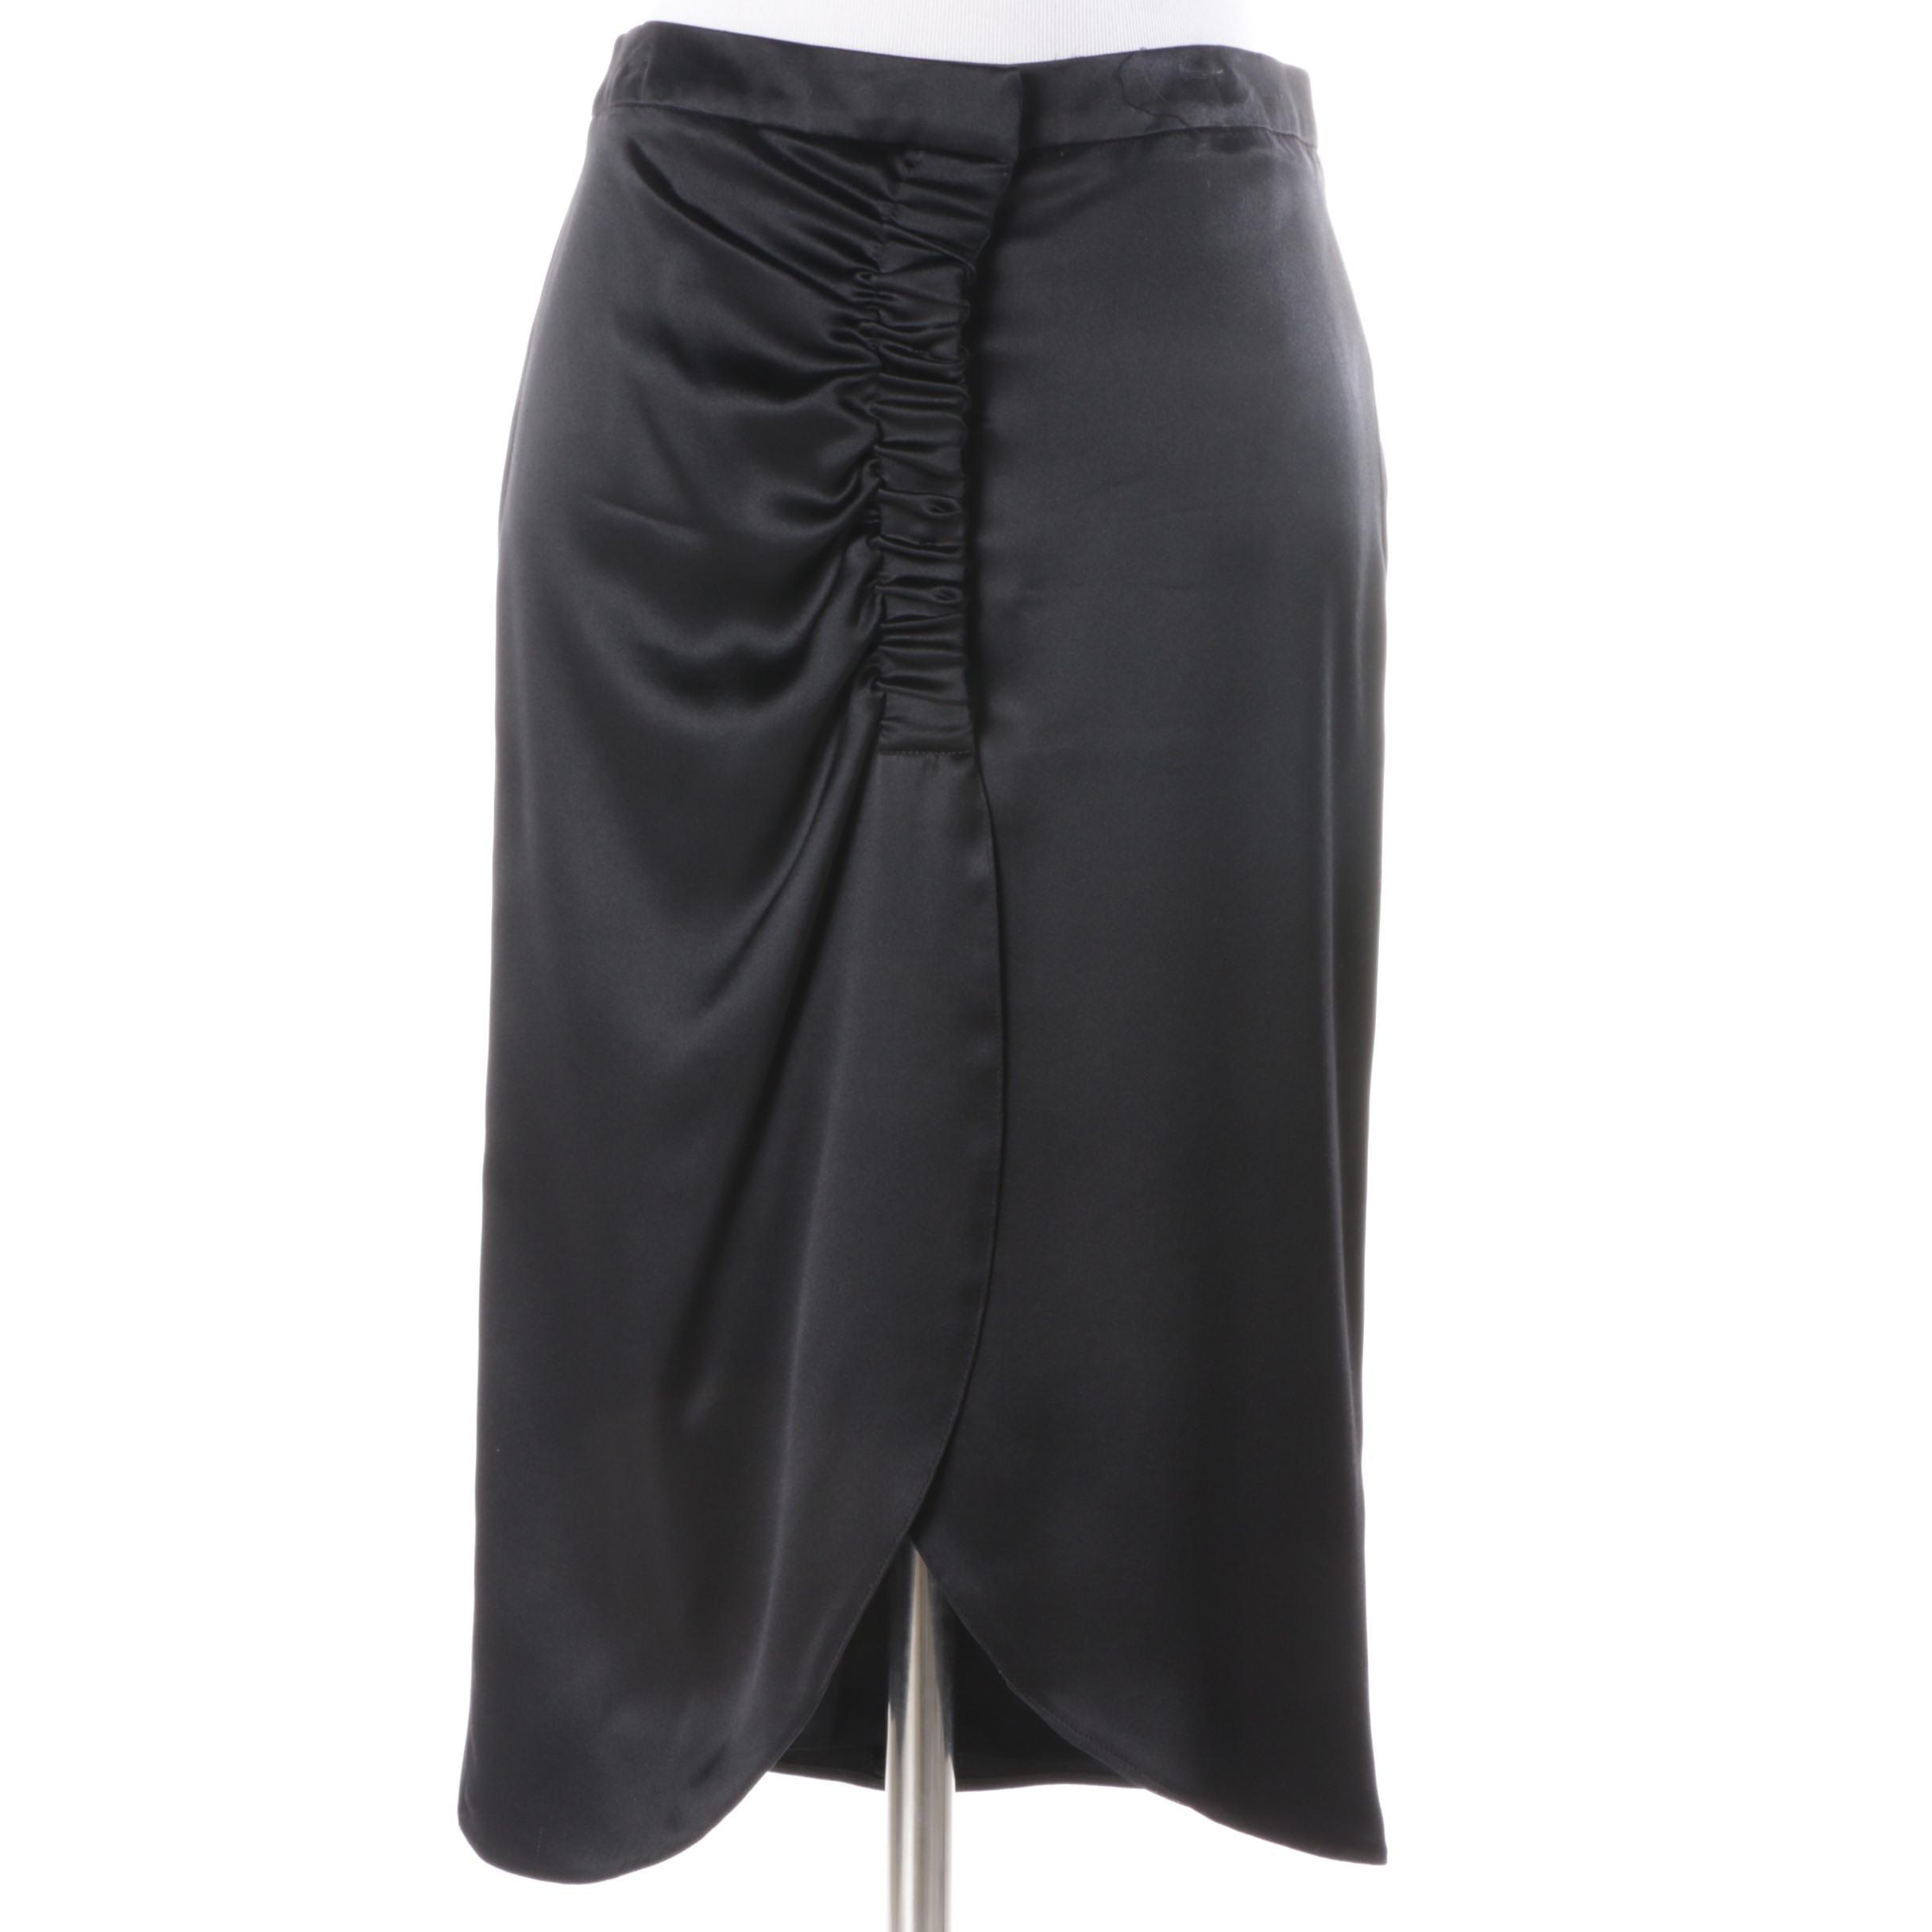 Giorgio Armani Black Silk Tulip Style Skirt